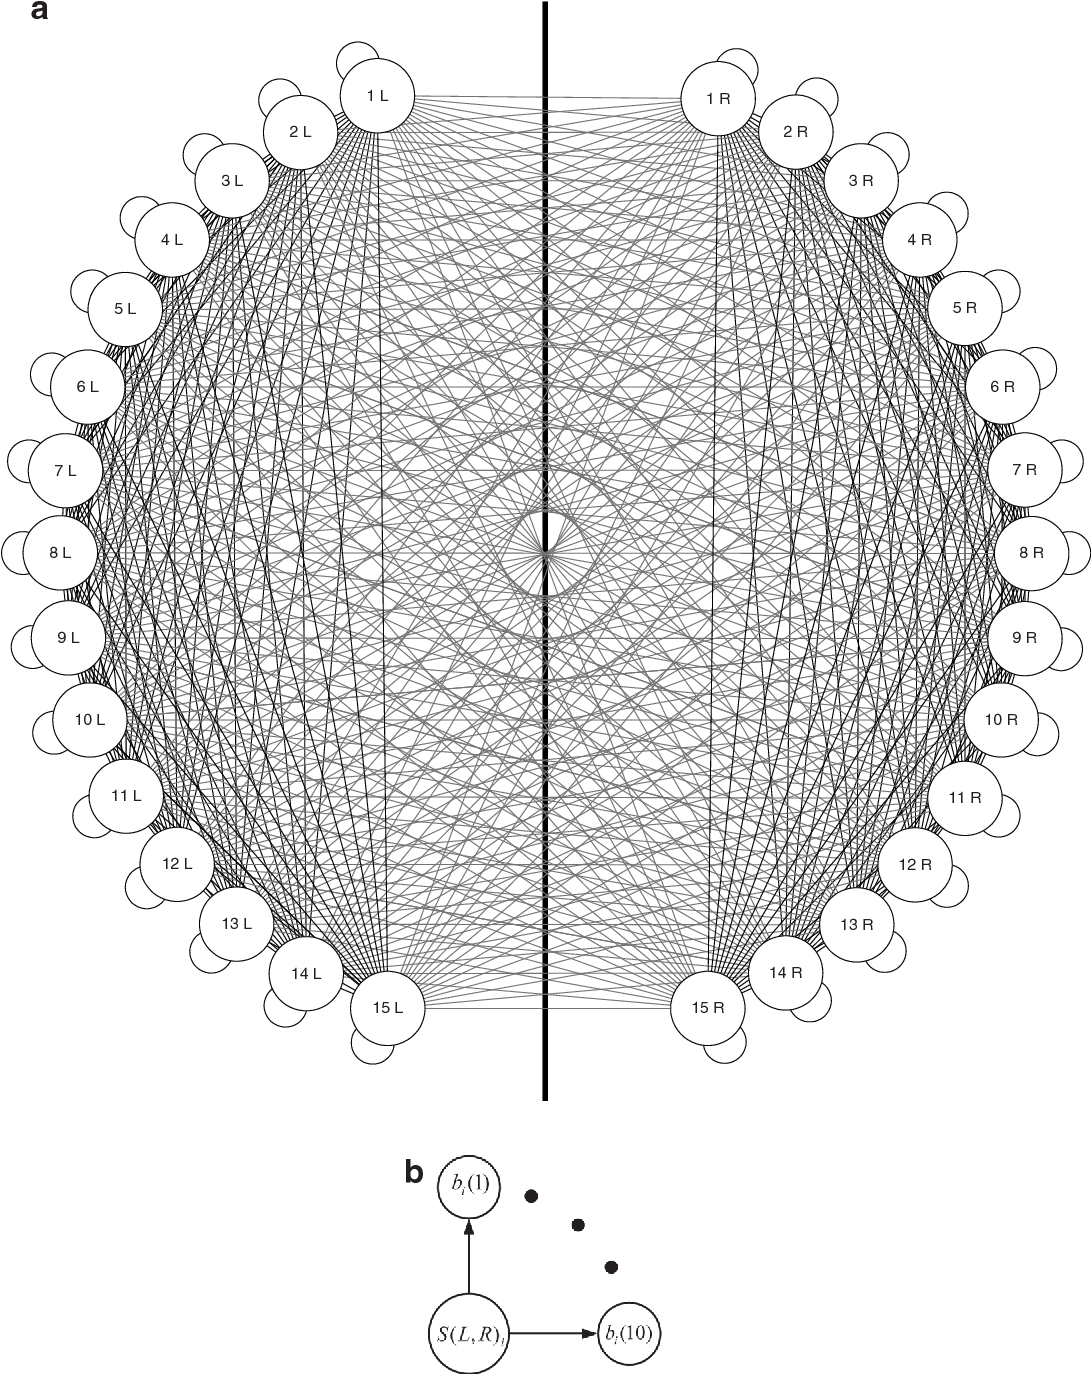 figure 25.4